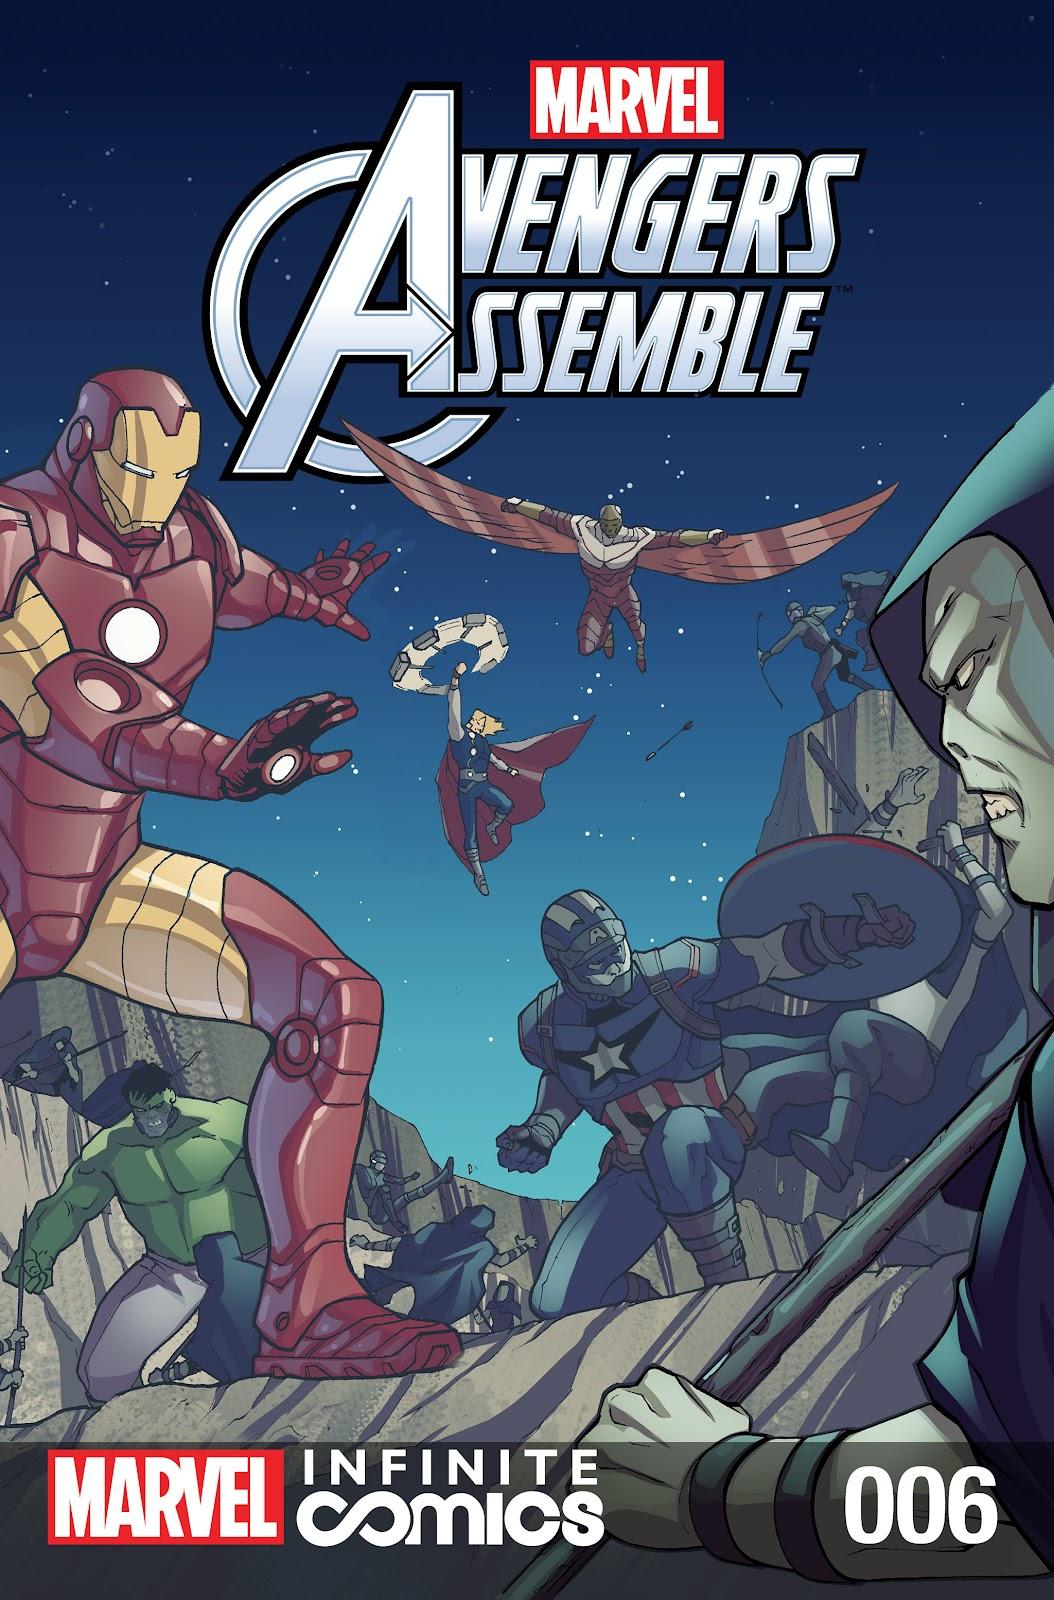 Marvel Universe Avengers Infinite Comic 6 Page 1